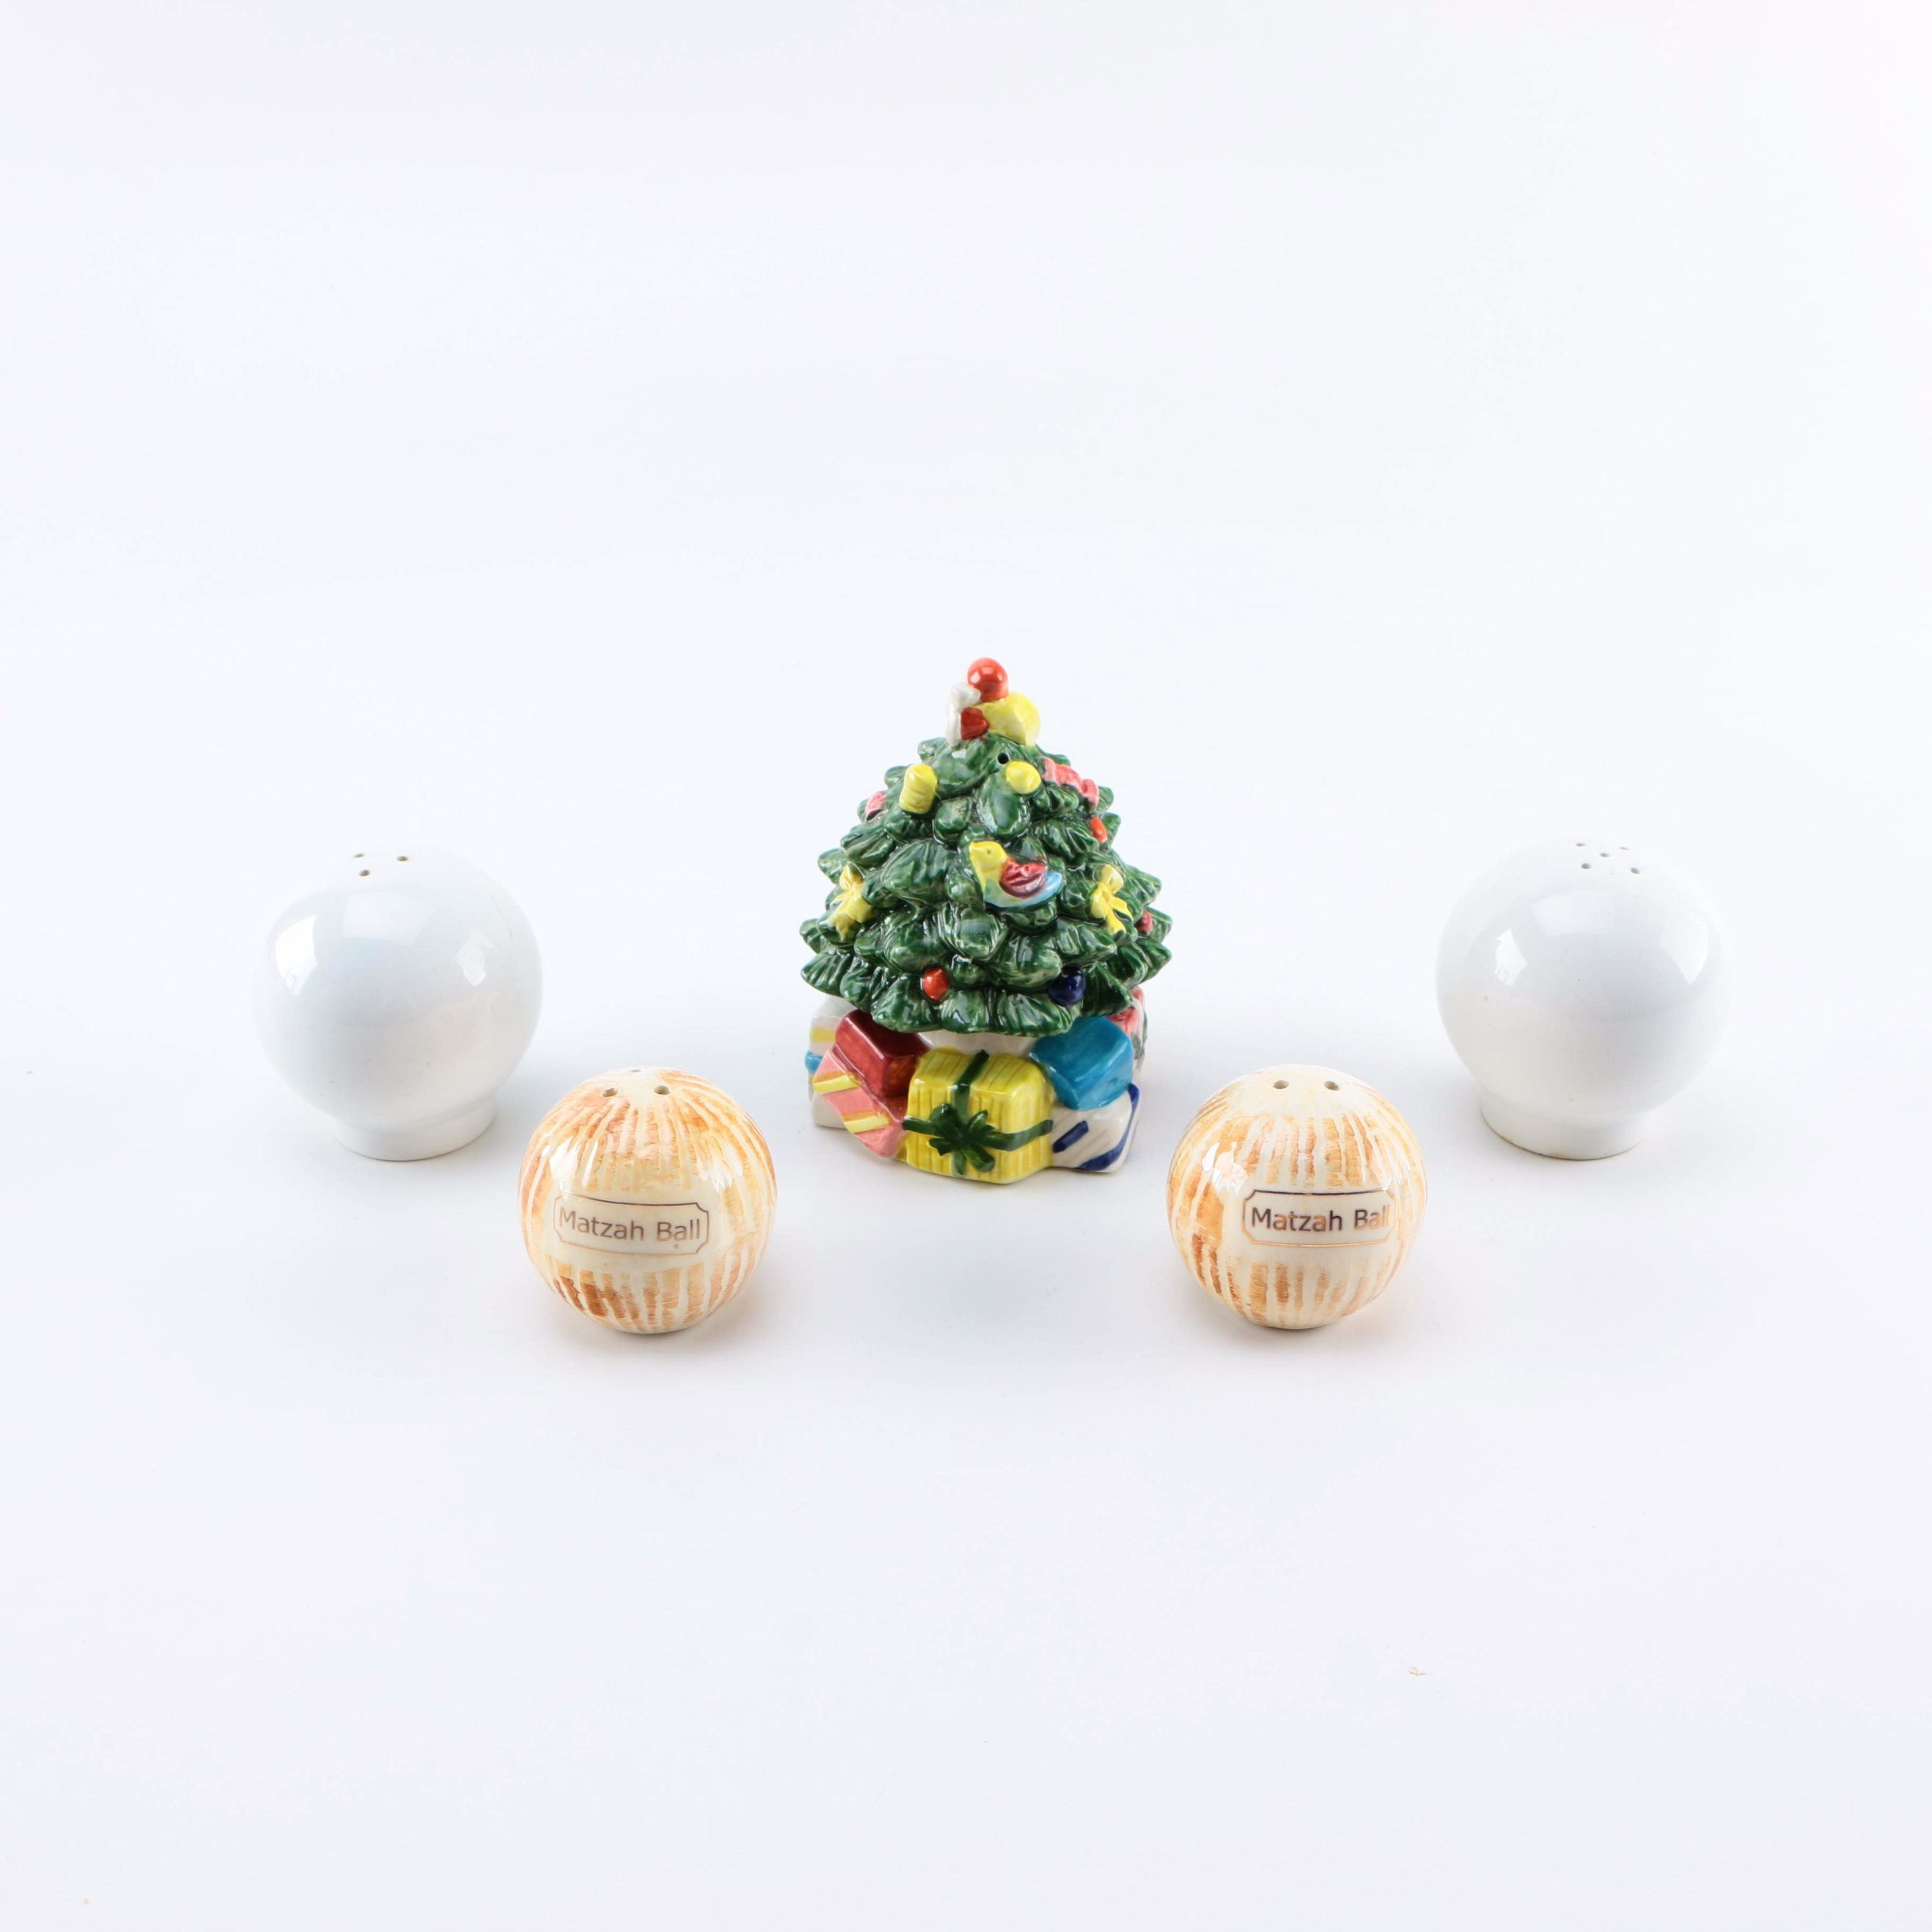 Assortment of Ceramic Salt and Pepper Shakers